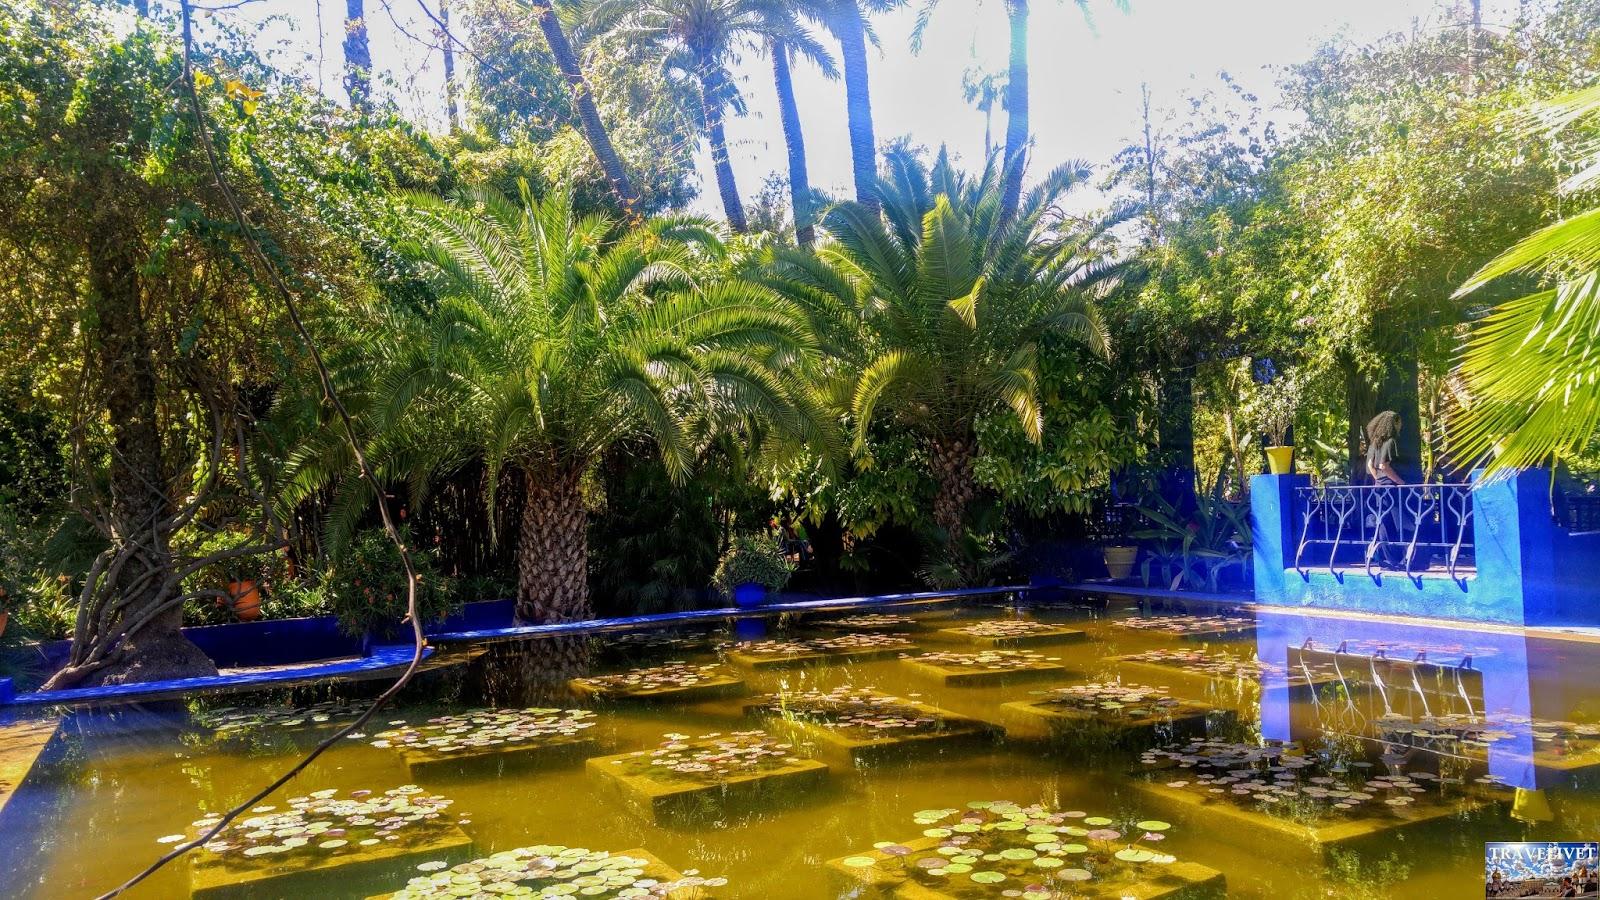 Maroc Marrakech Les Jardins de Majorelle